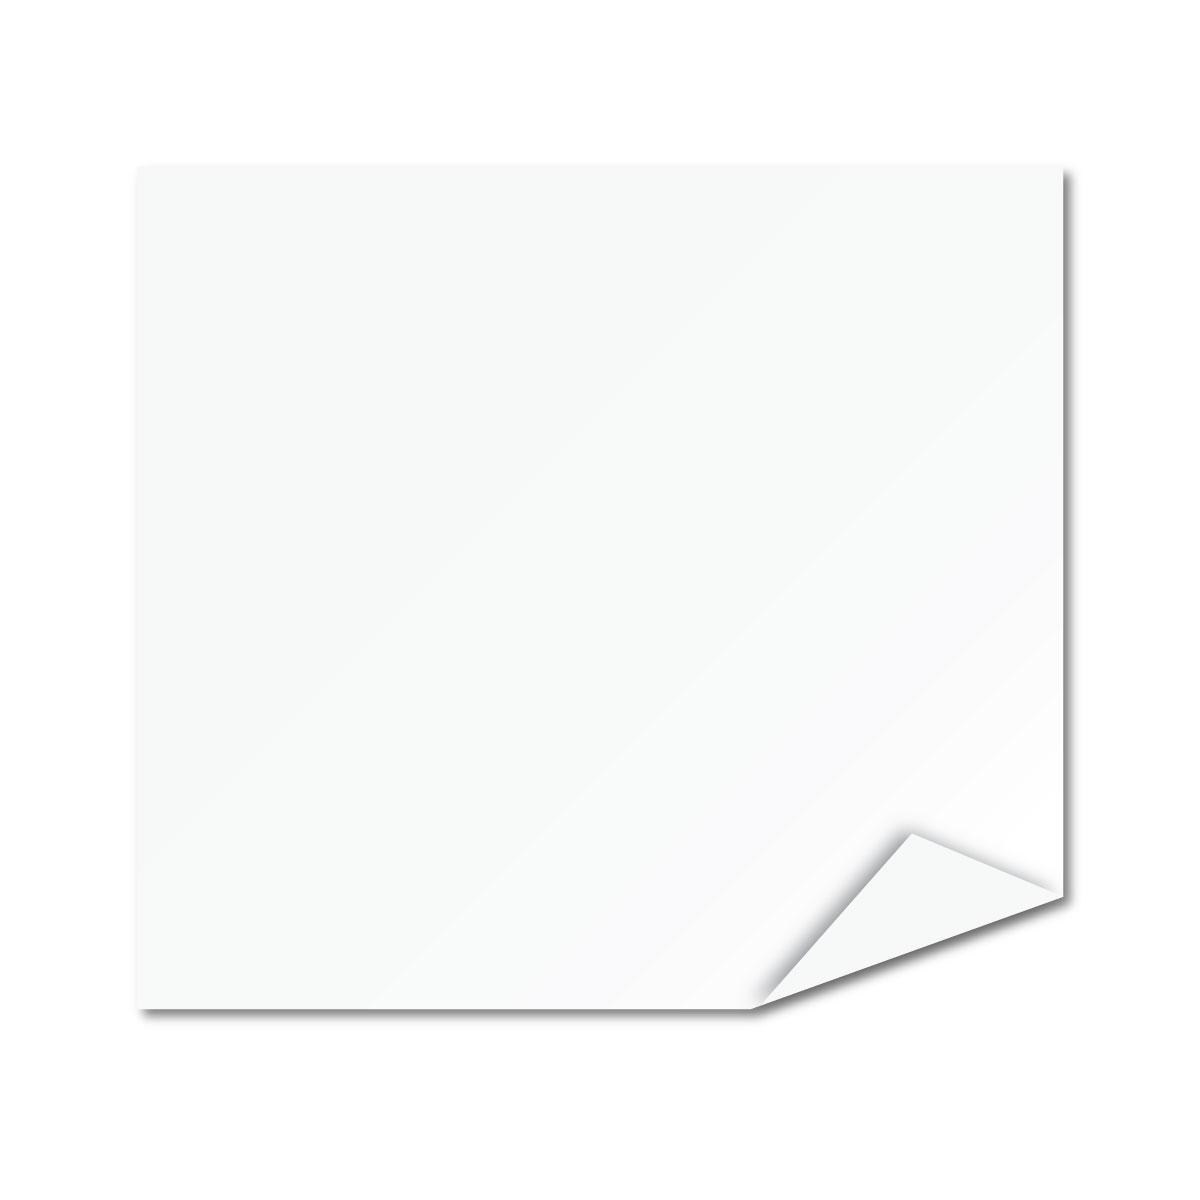 pvb 038mm vanceva polar white interleaved 2460mm